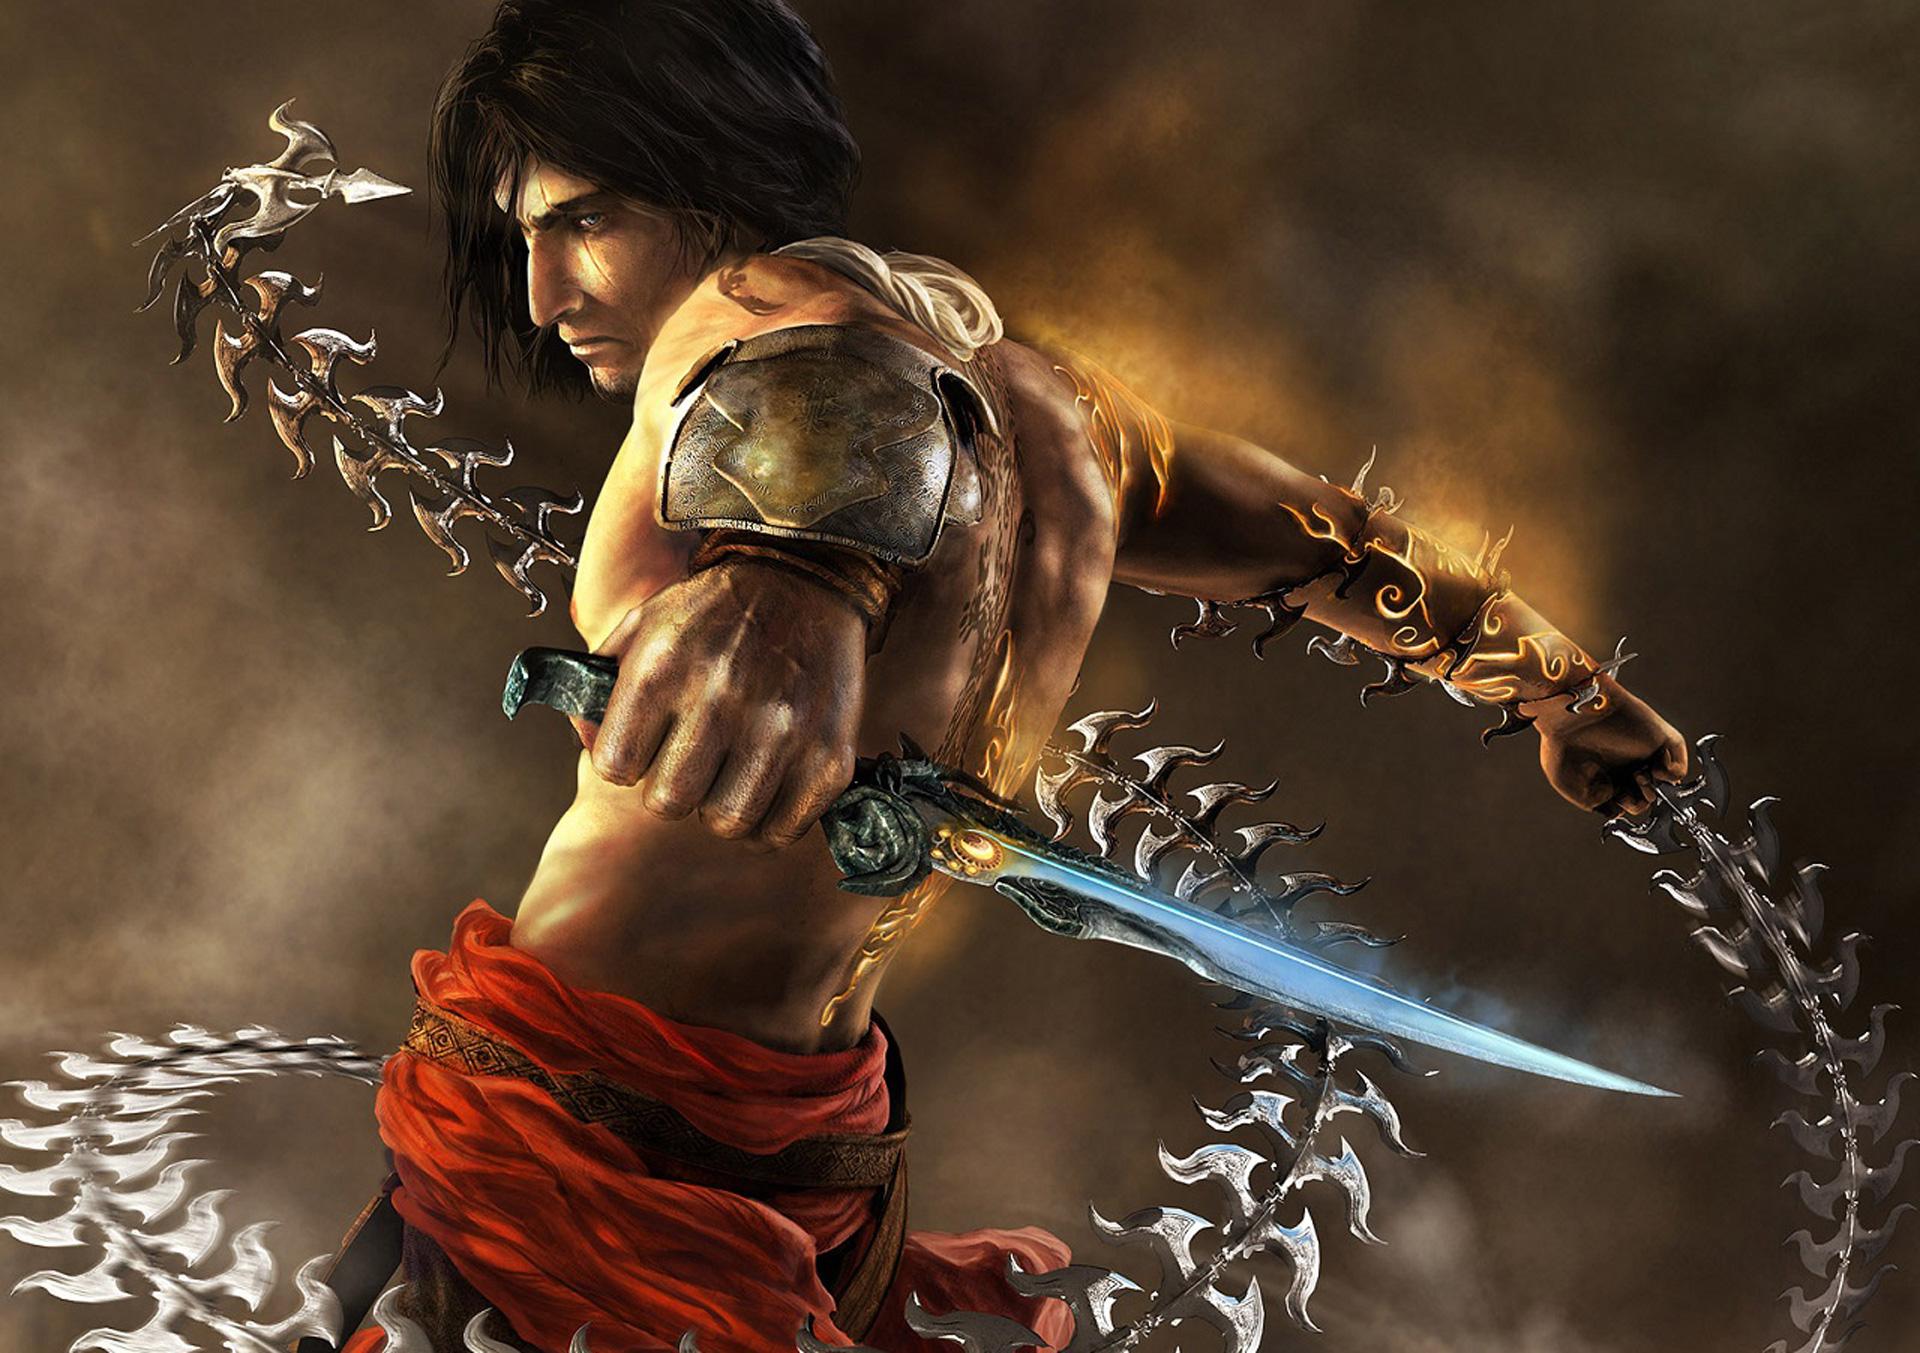 73 Prince Of Persia Wallpapers On Wallpapersafari